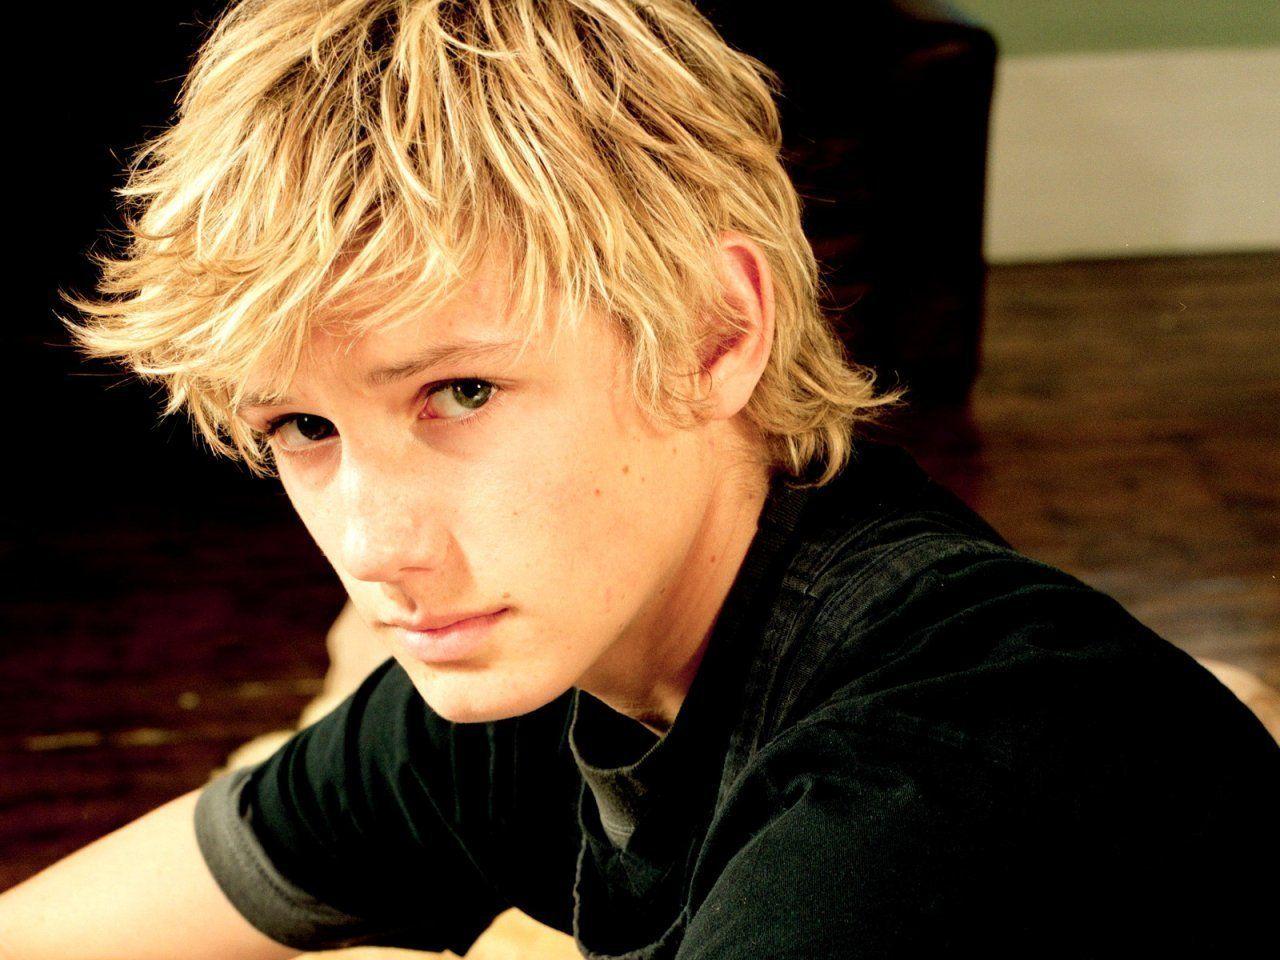 Blonde Jungen Frisuren Blonde Jungen Frisuren Blonde Hair Boy Men Blonde Hair Blonde Hair Brown Eyes